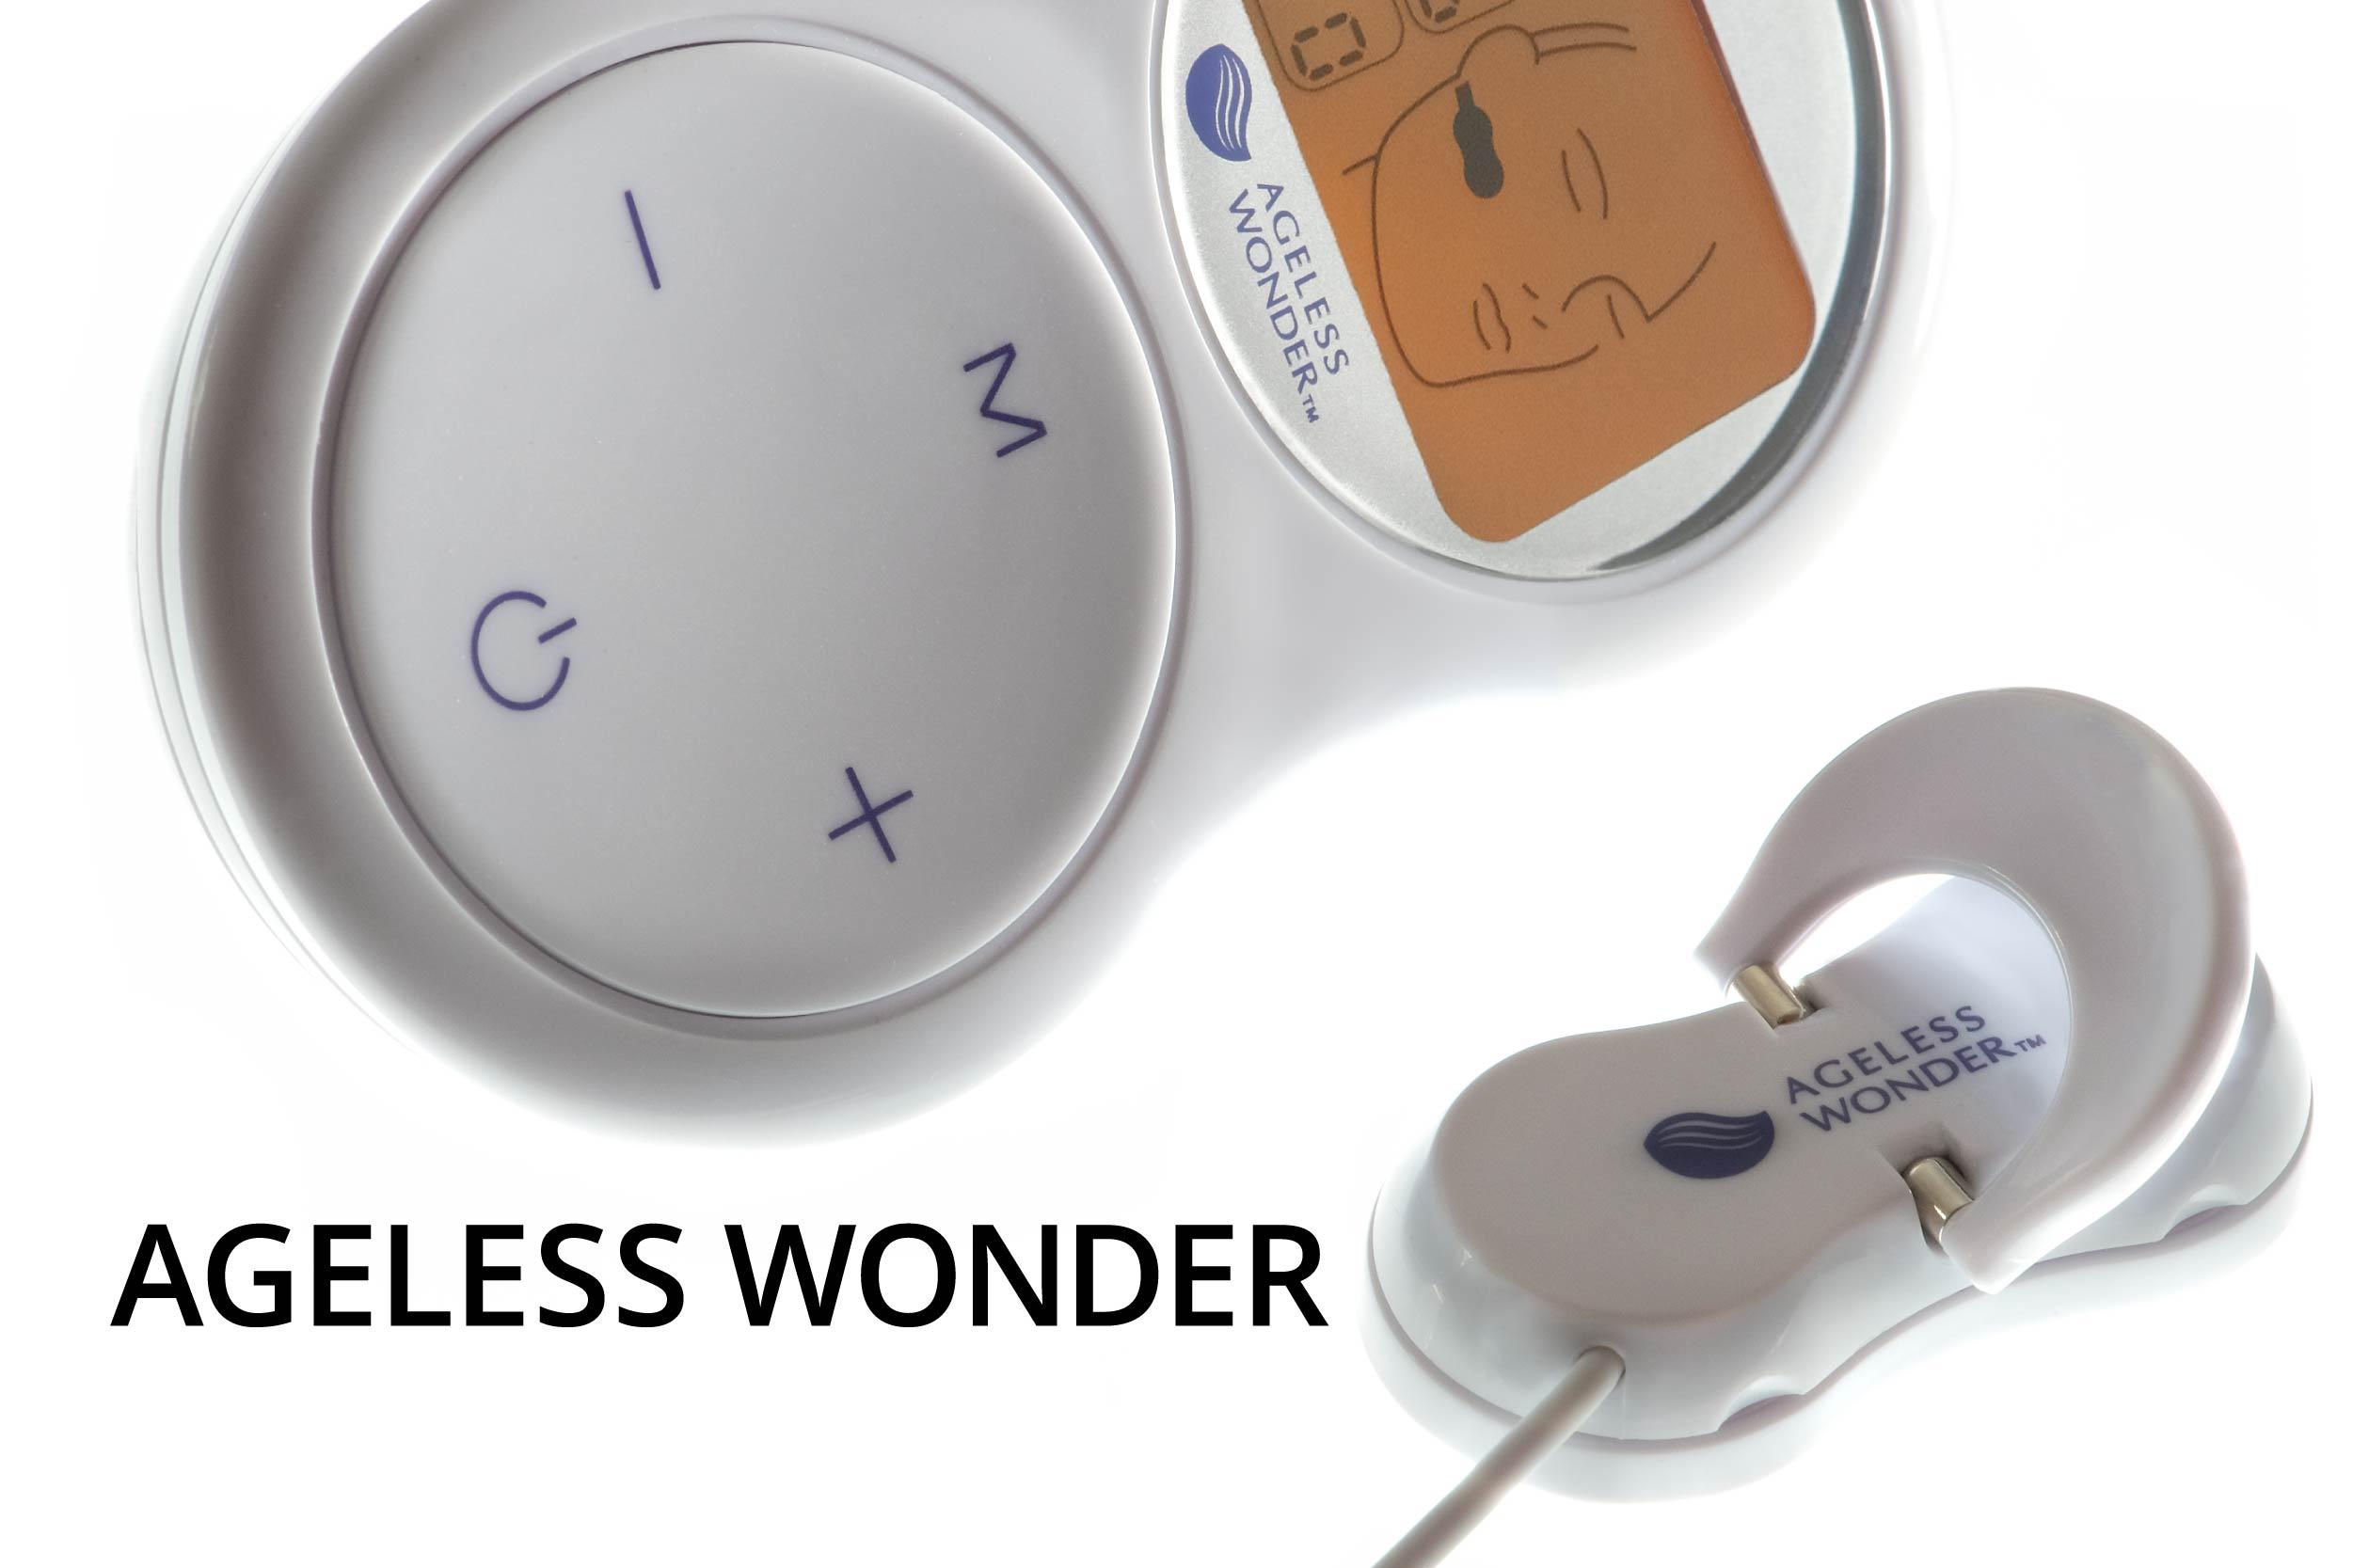 AGELESS WONDER